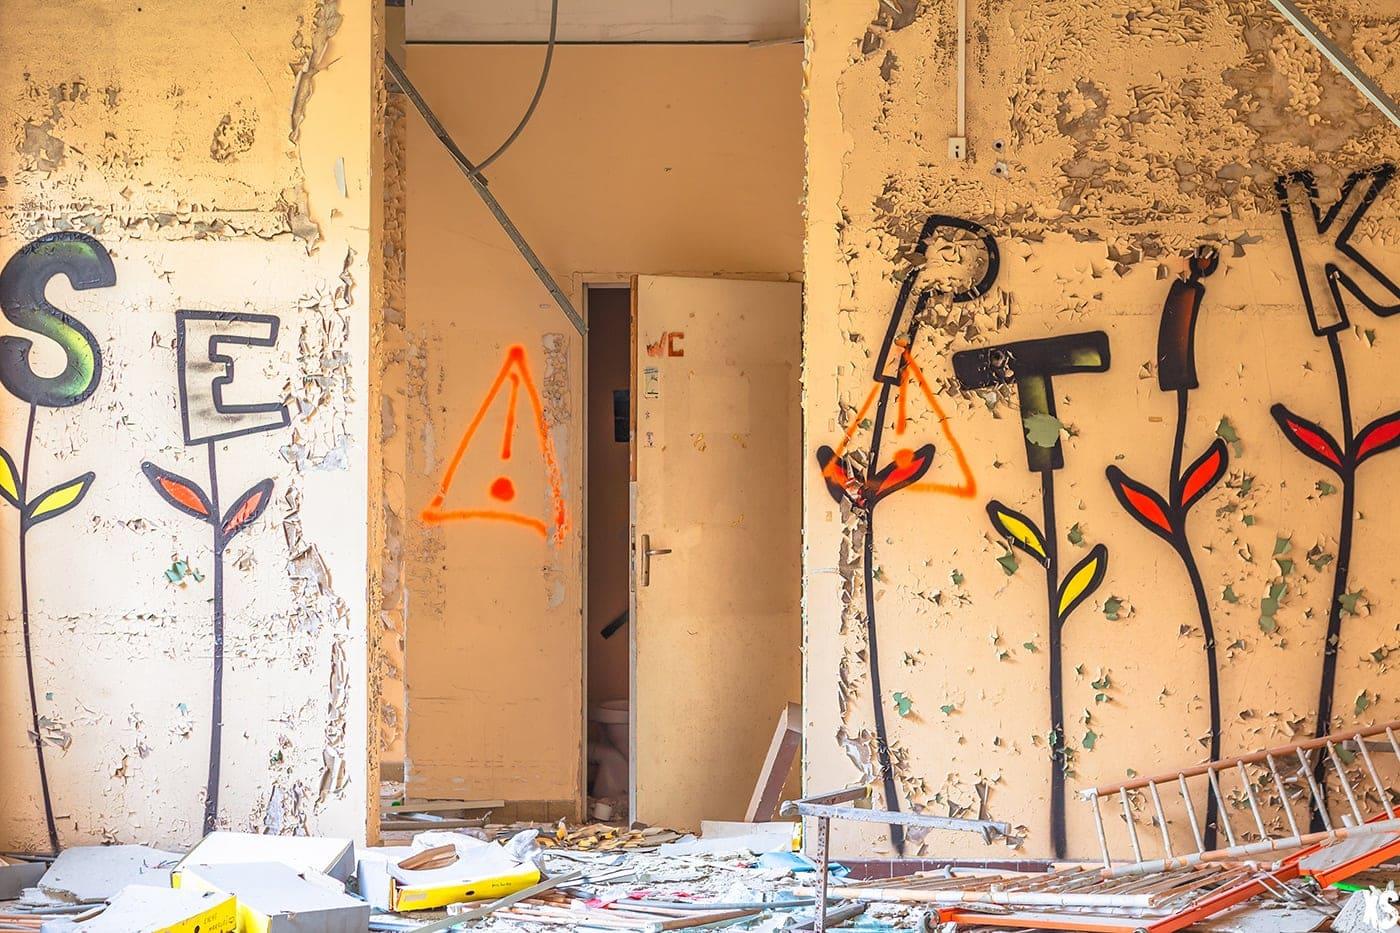 sanatorium-nestor-pirotte-21